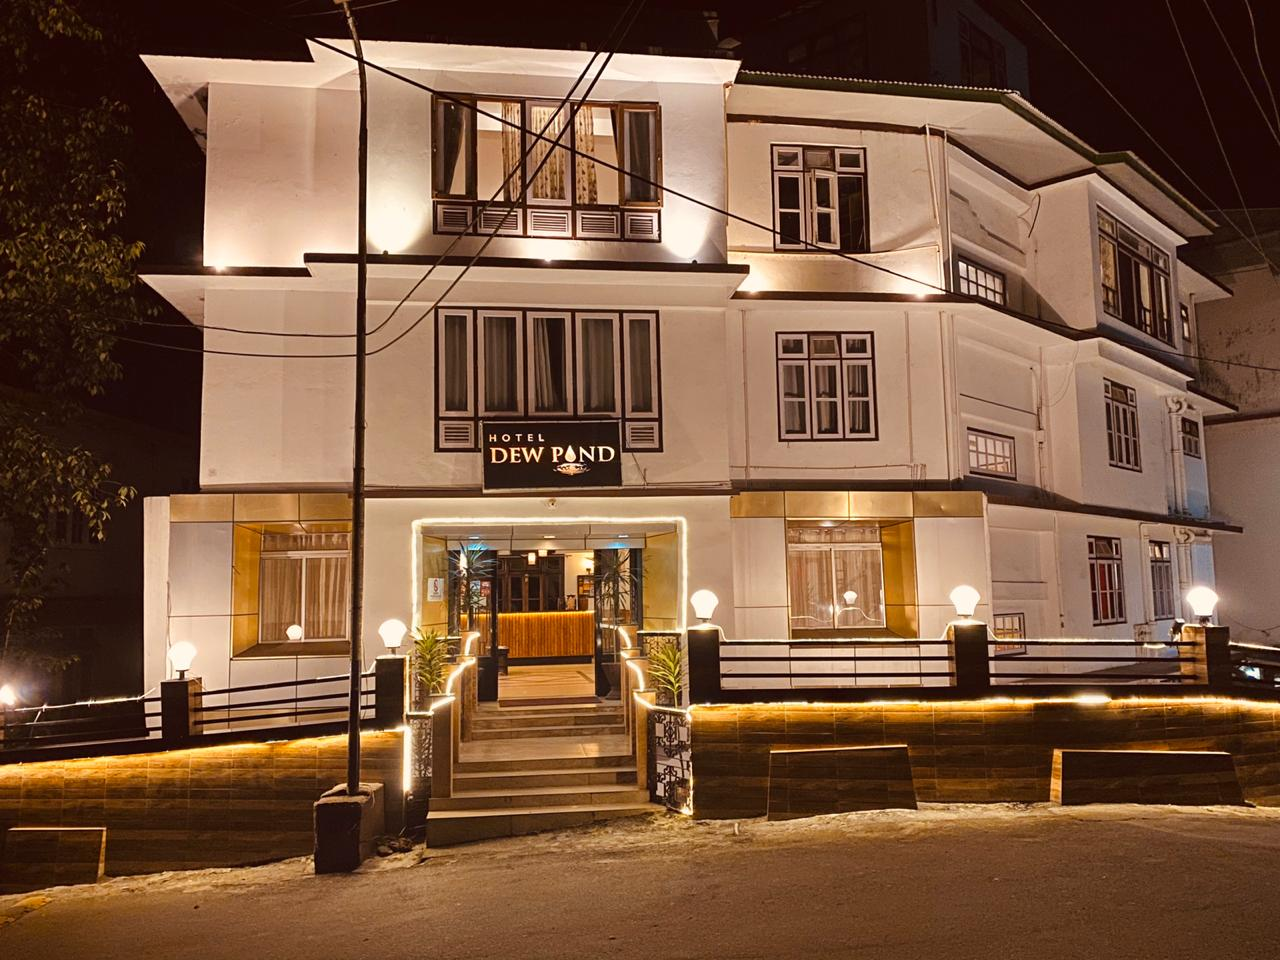 Hotel Dew Pond